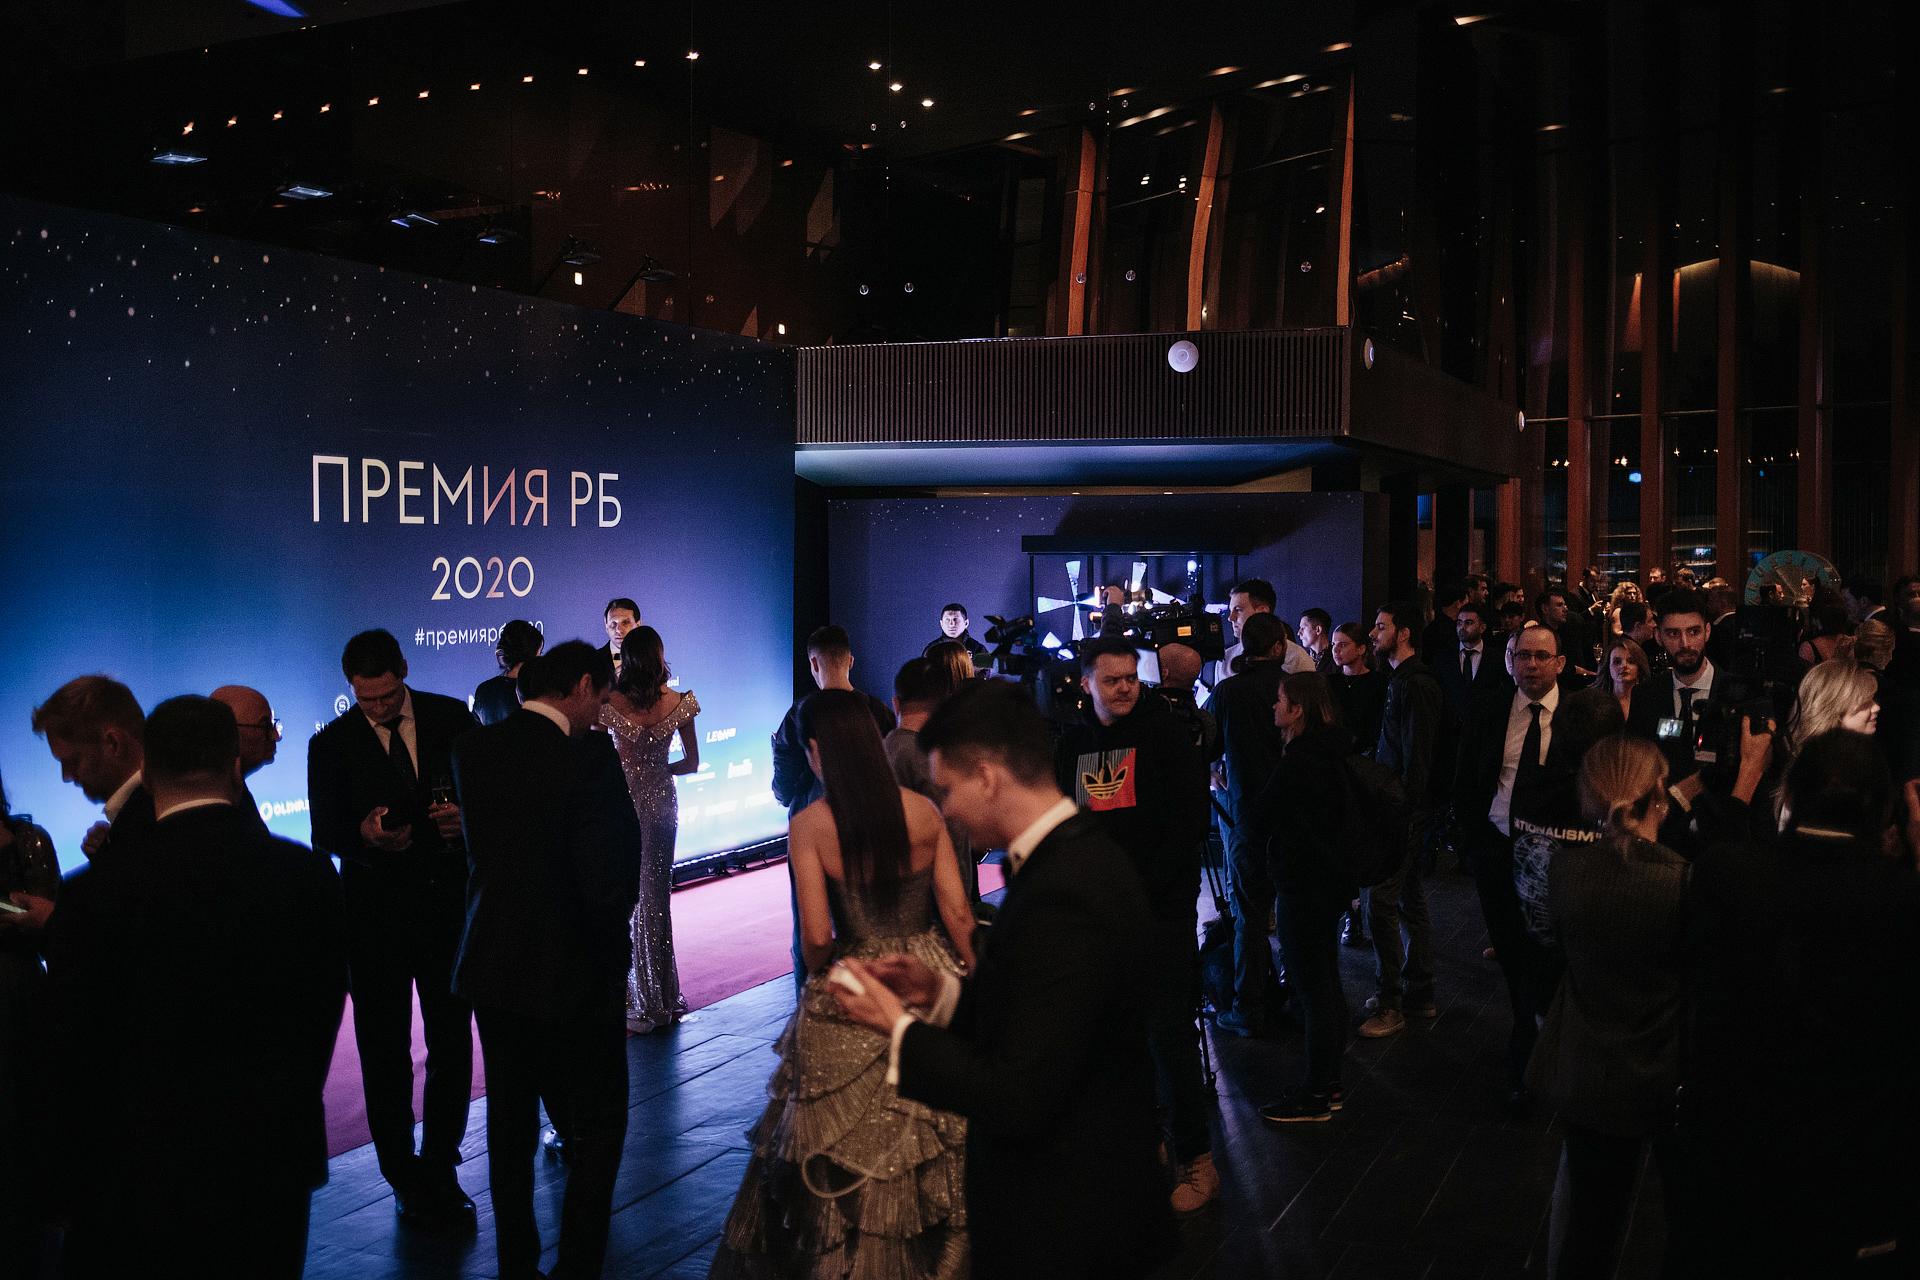 NAVI и Winstrike проголосуют за лучшее партнёрство в киберспорте